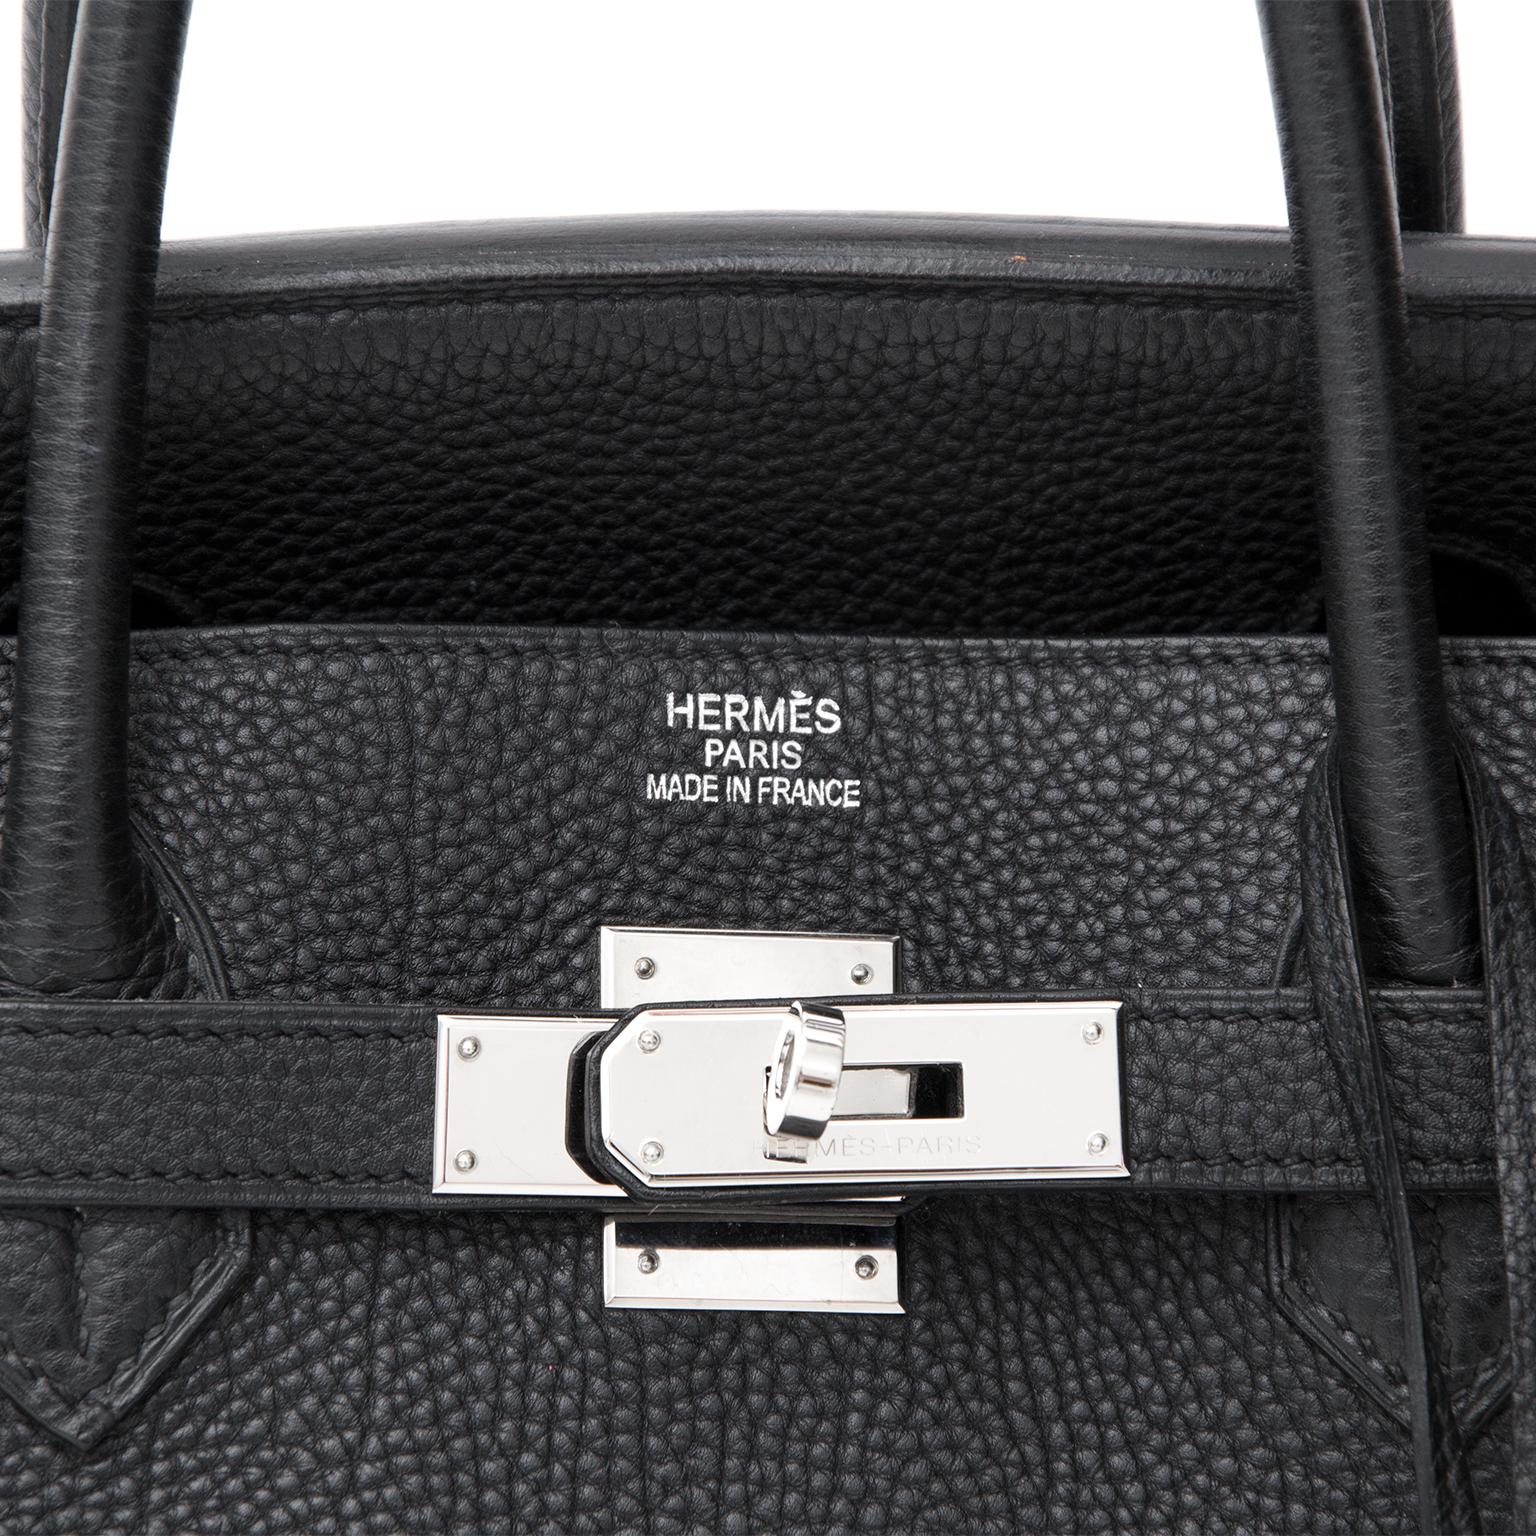 e1c78f306f1 ... noir 2163f d1182 discount koop veilig online tweedehands hermès birkin  bag 40 black togo phw b2932 f995e ...